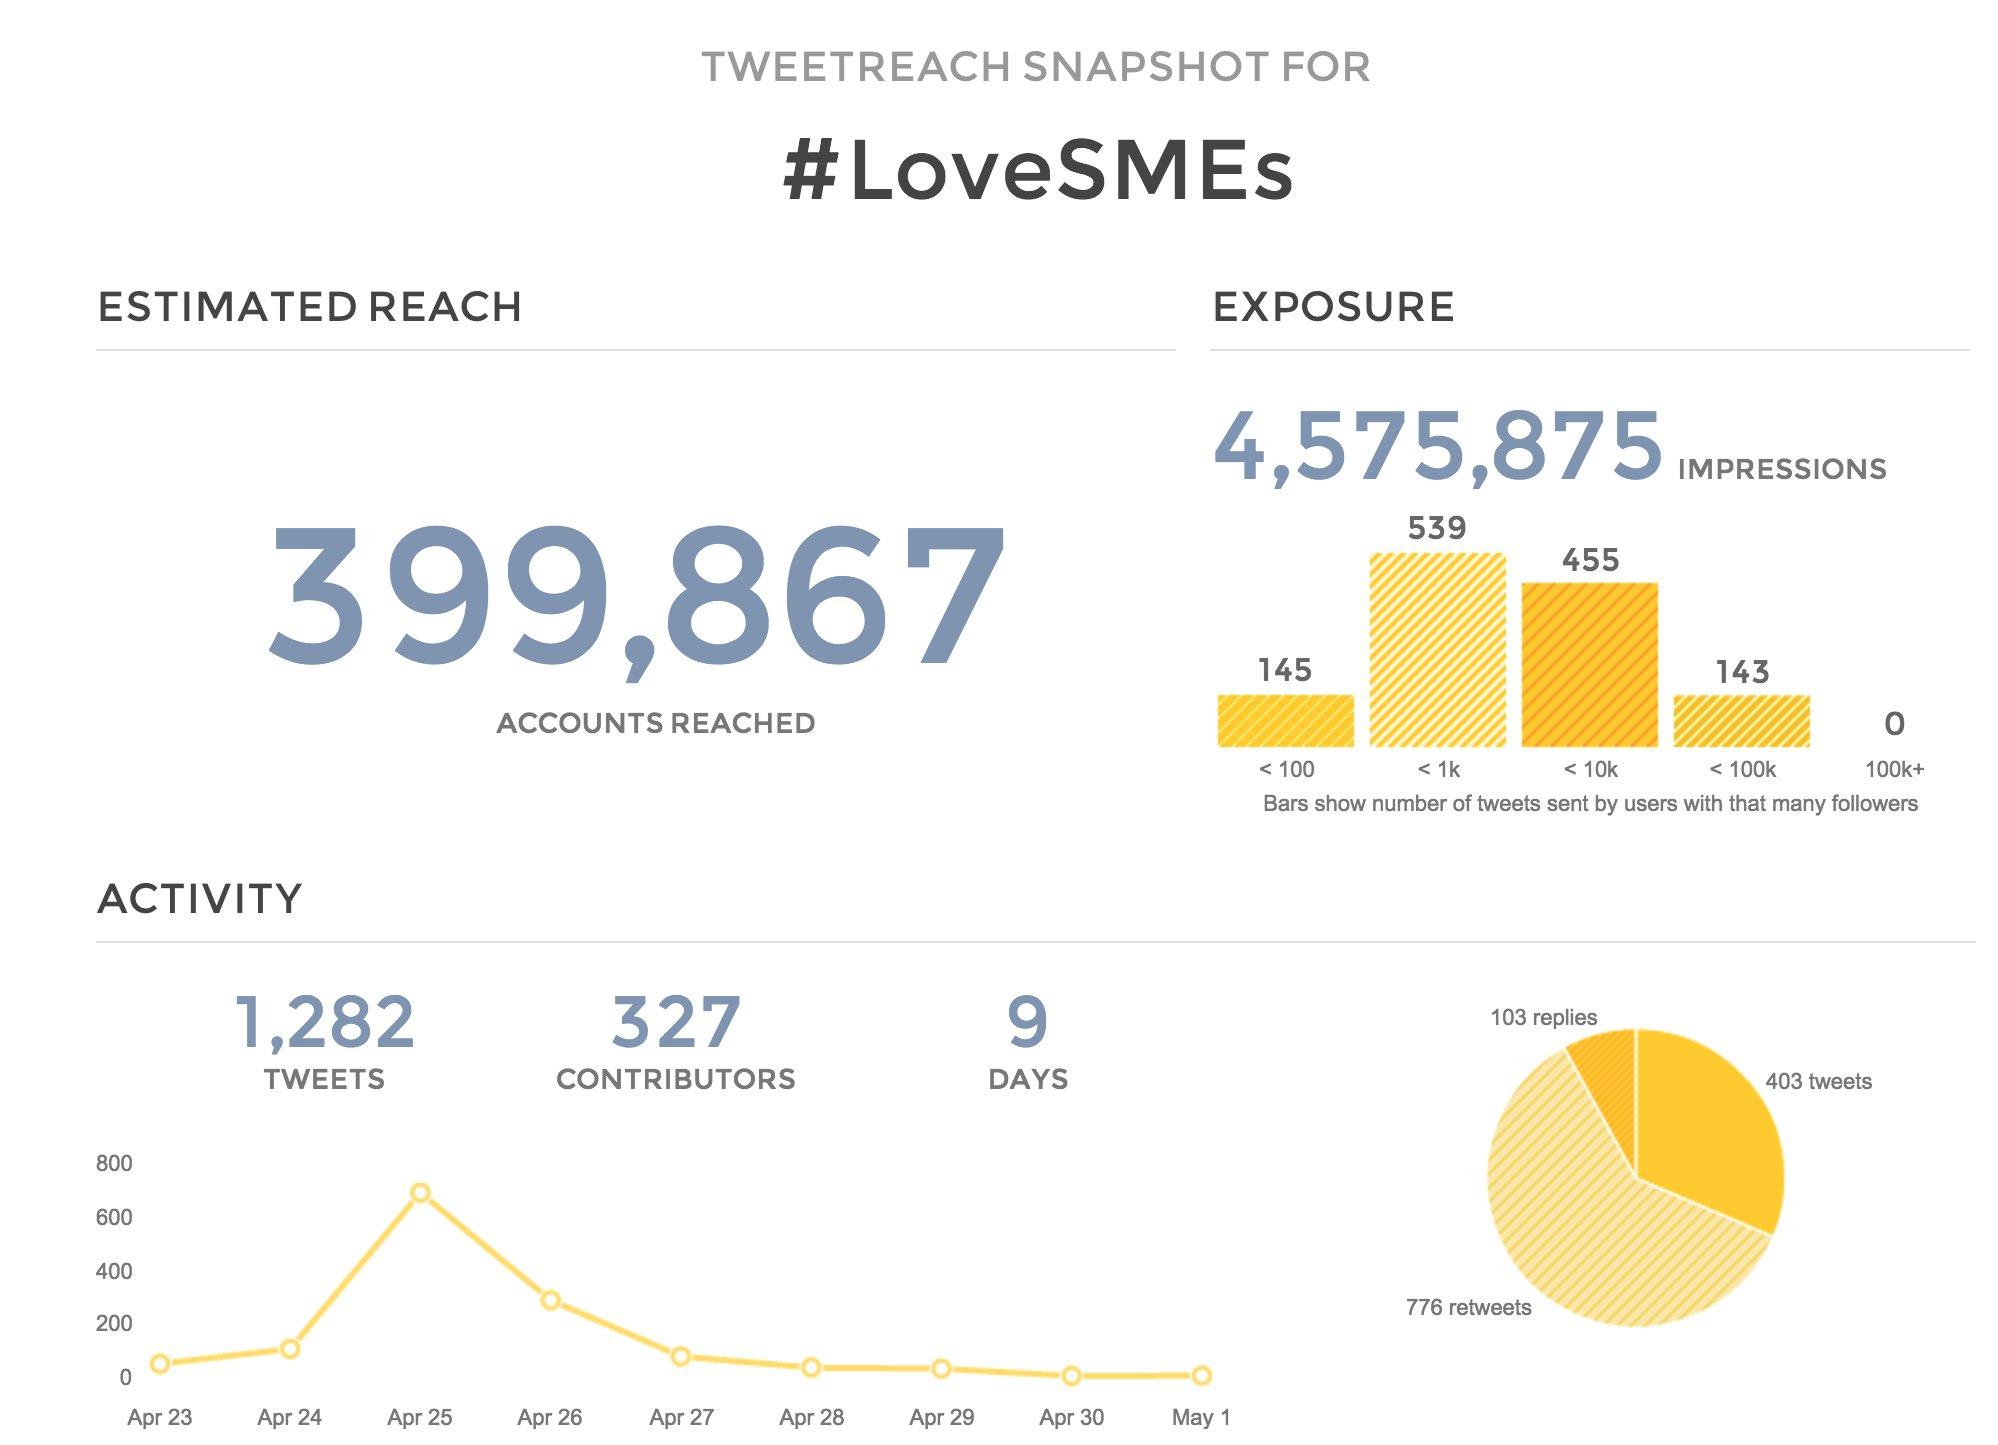 tweetreach-snapshot-headline-stats-sme-awards-2015